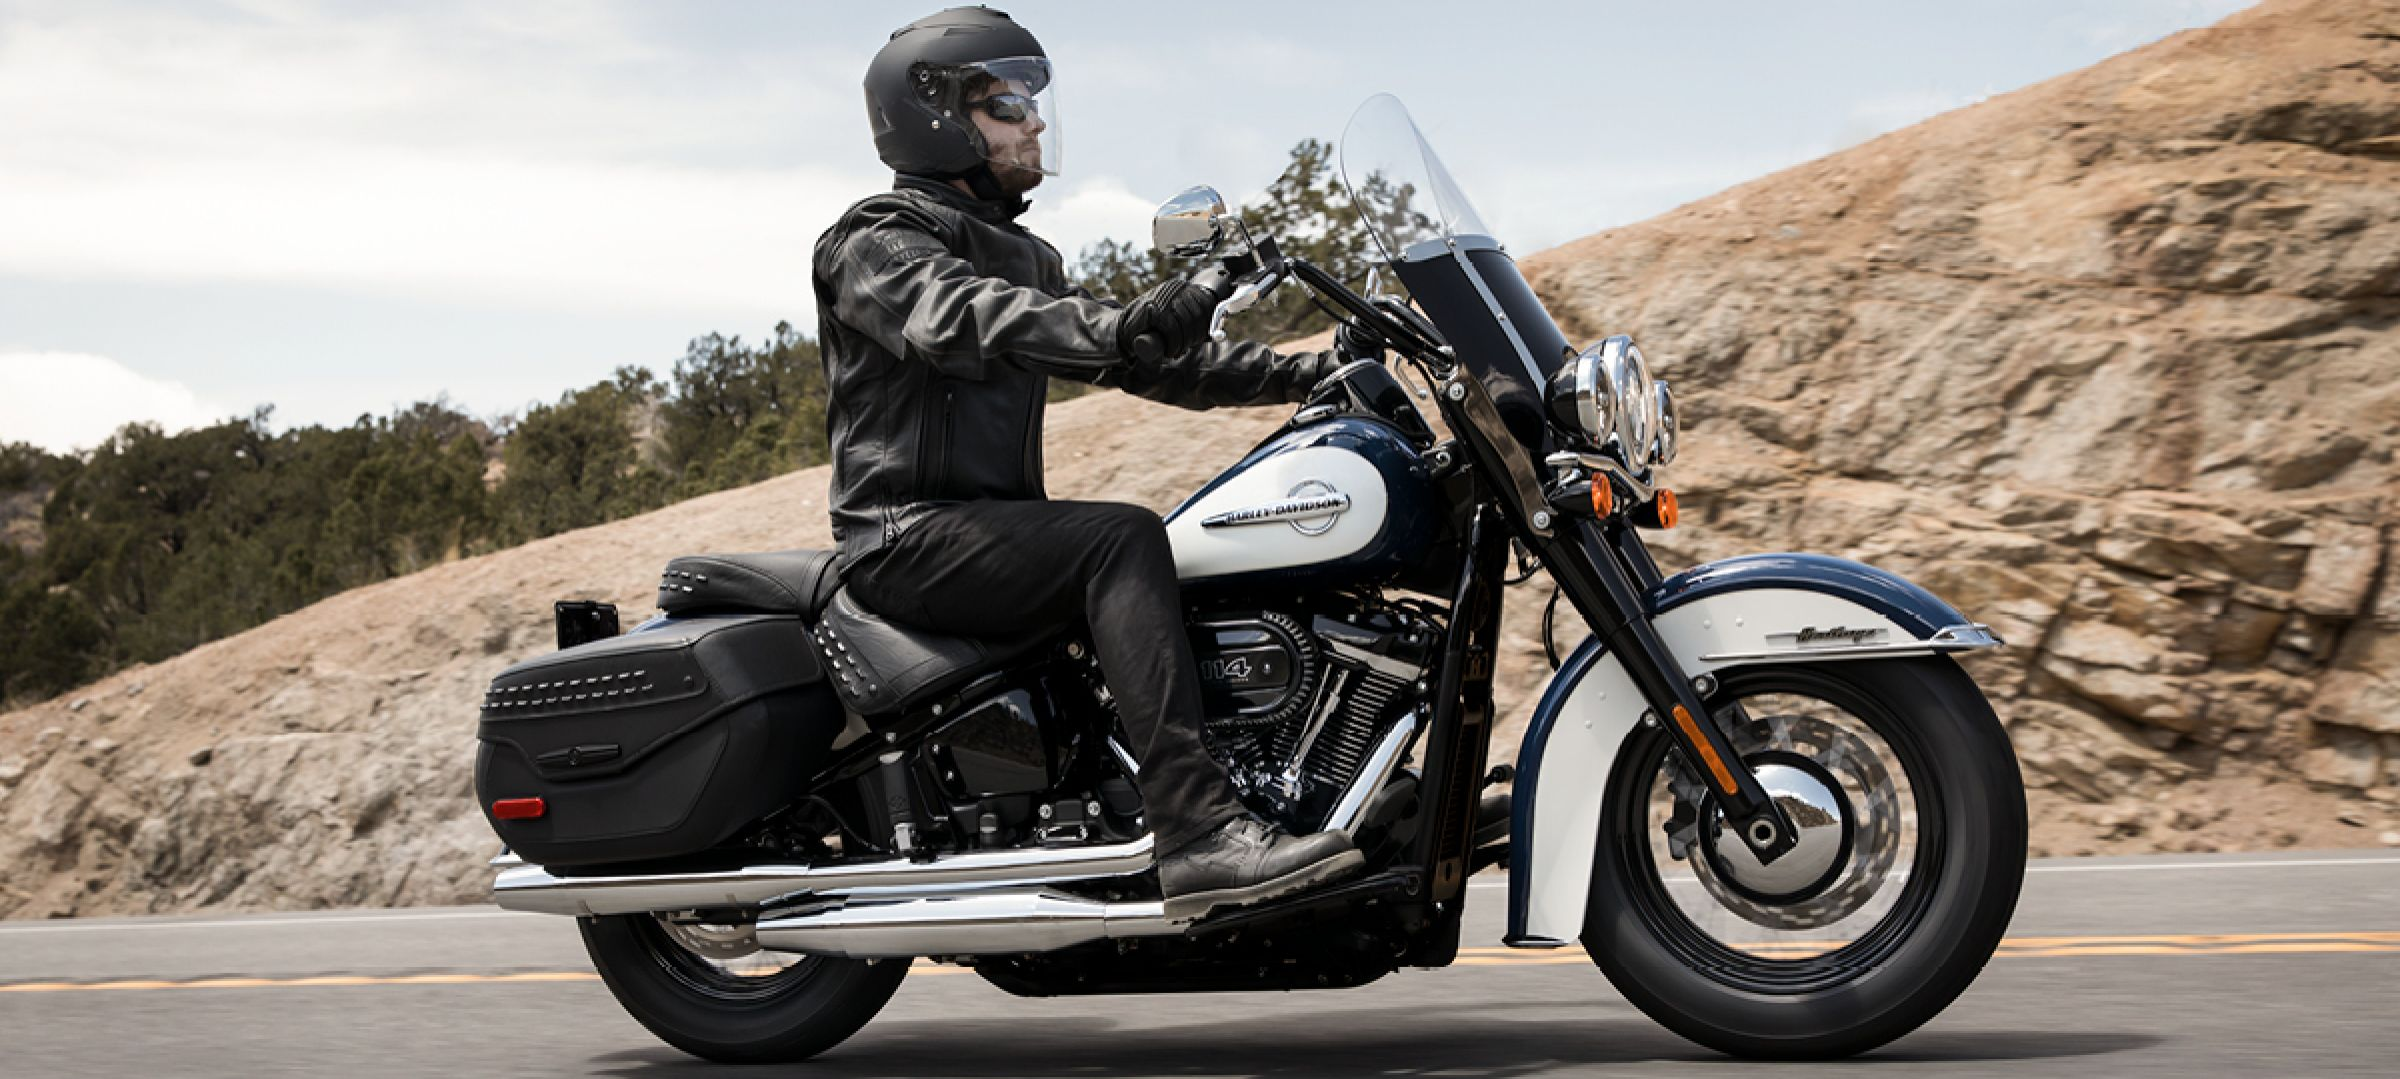 Home | Yellowstone Harley-Davidson®